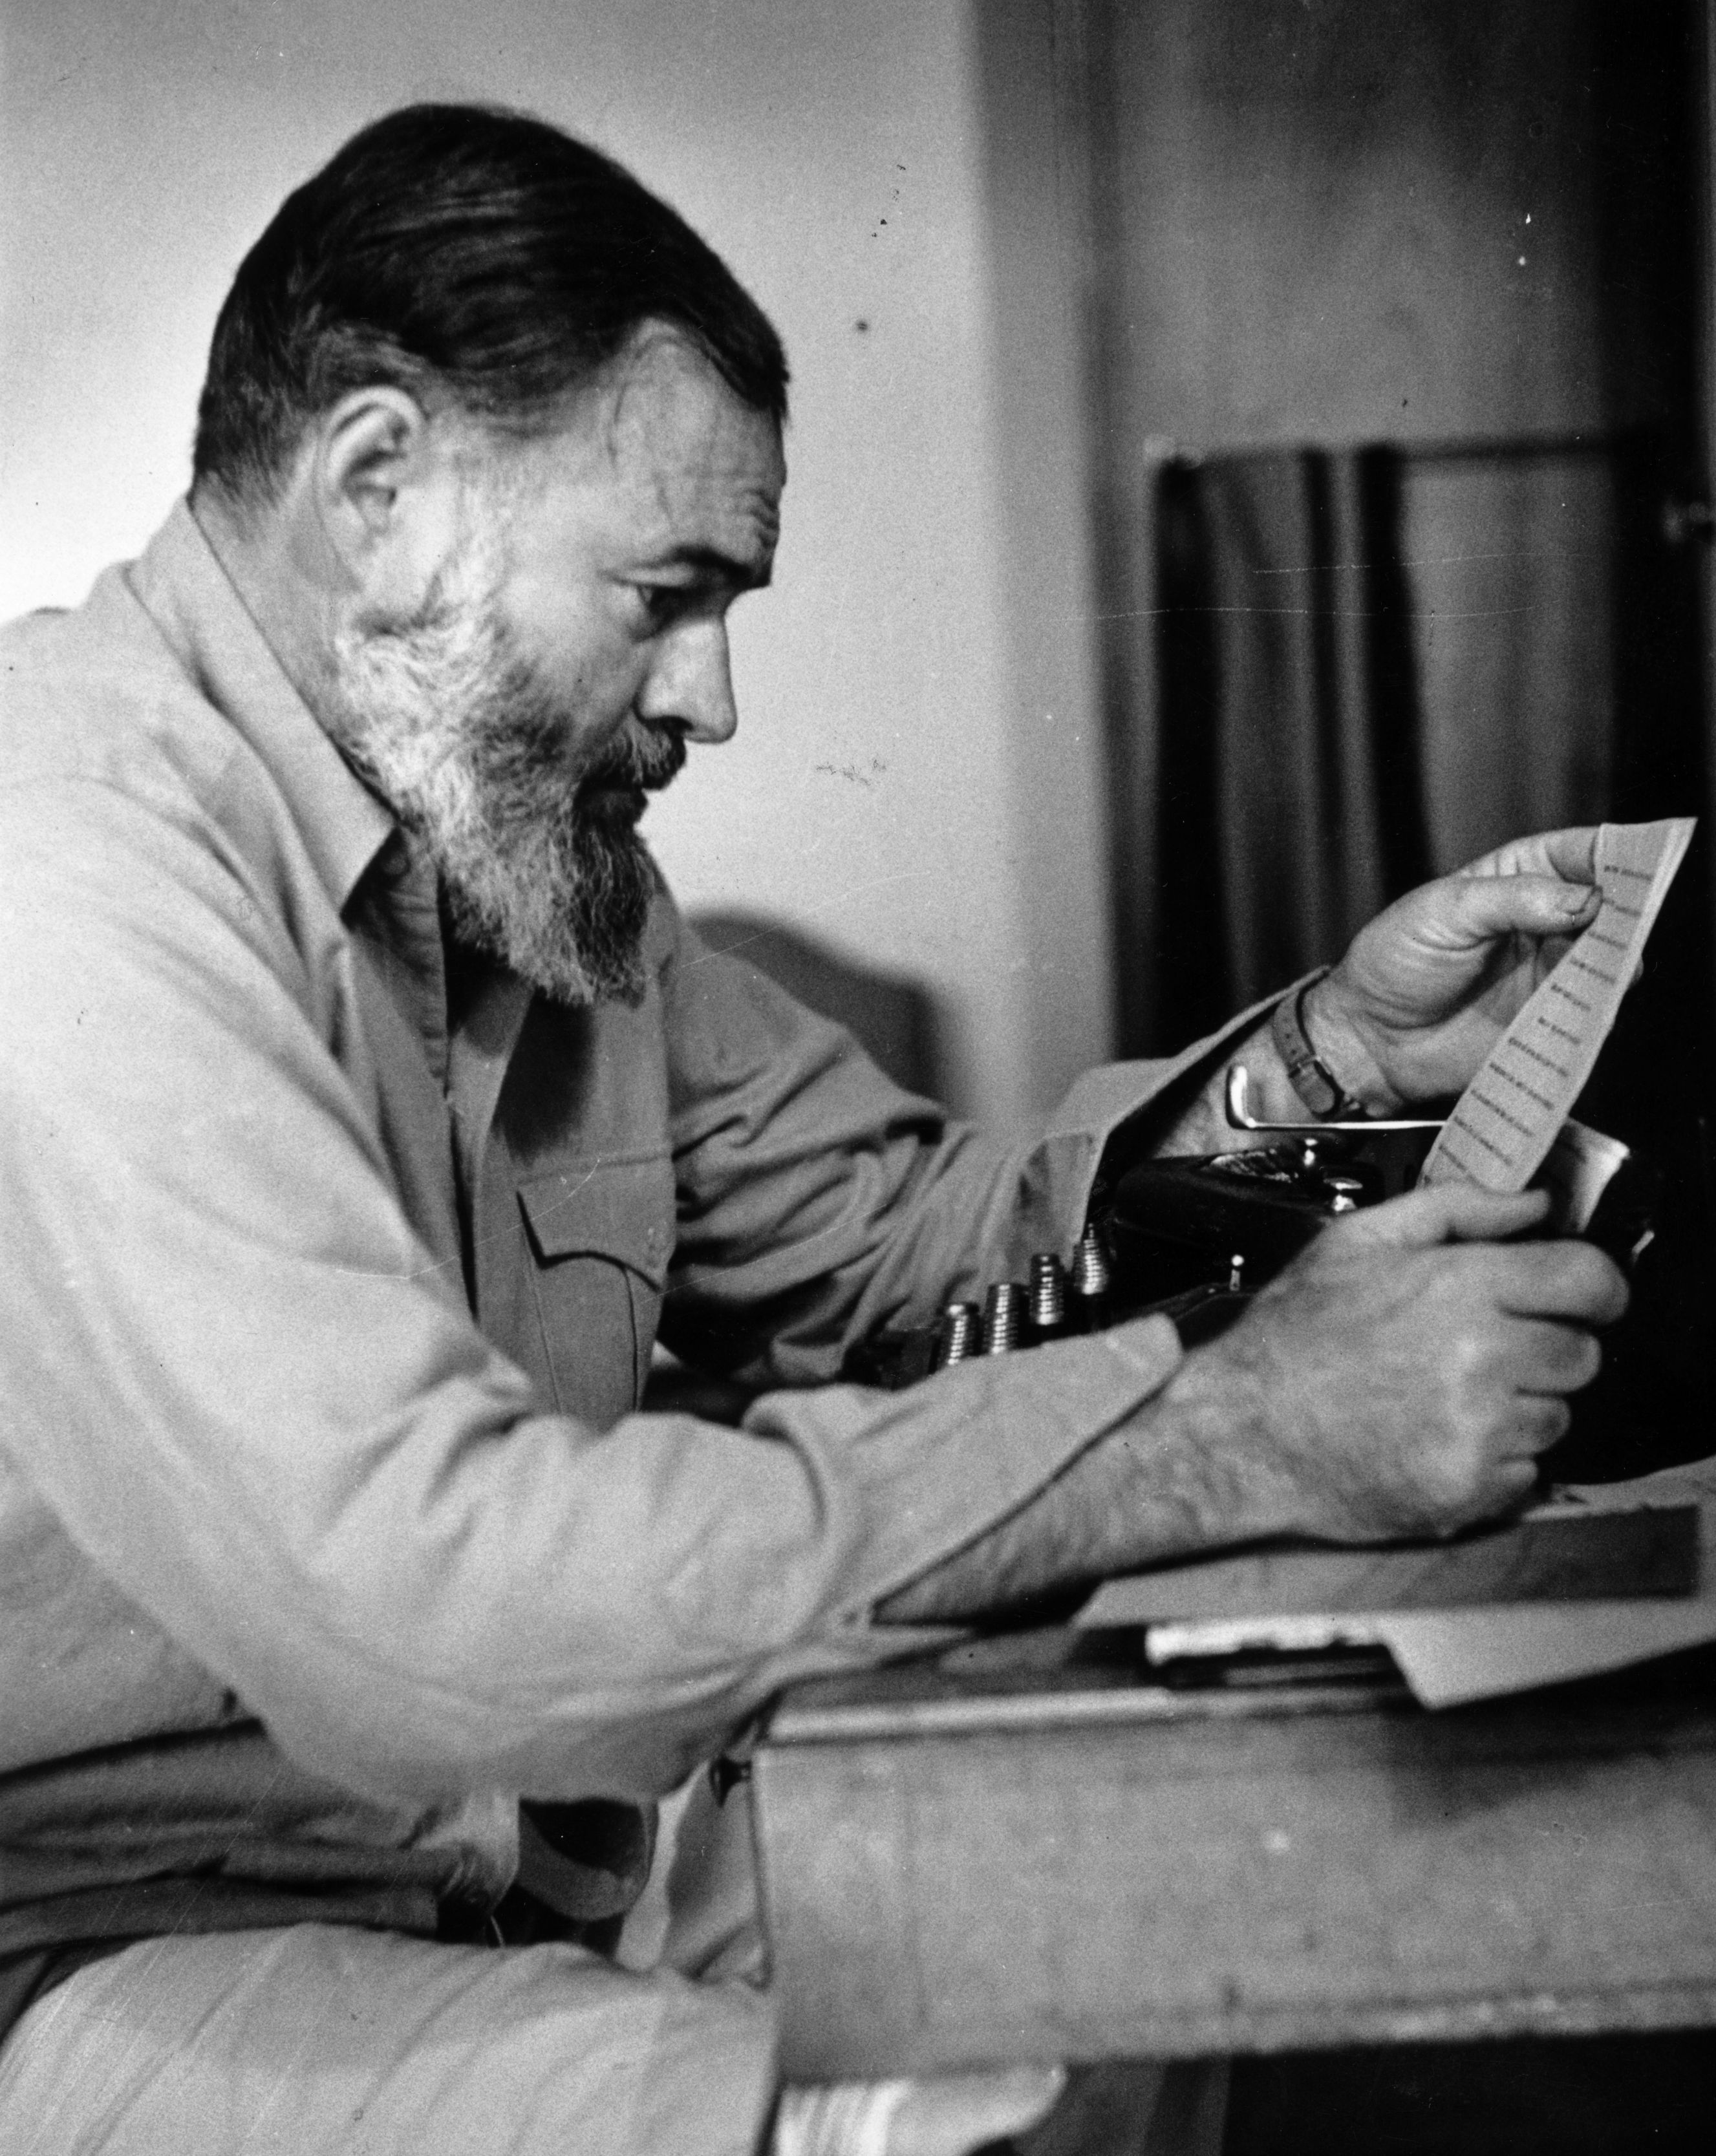 Ernest Hemingway (1944 - Photo by Kurt Hutton/Getty Images)